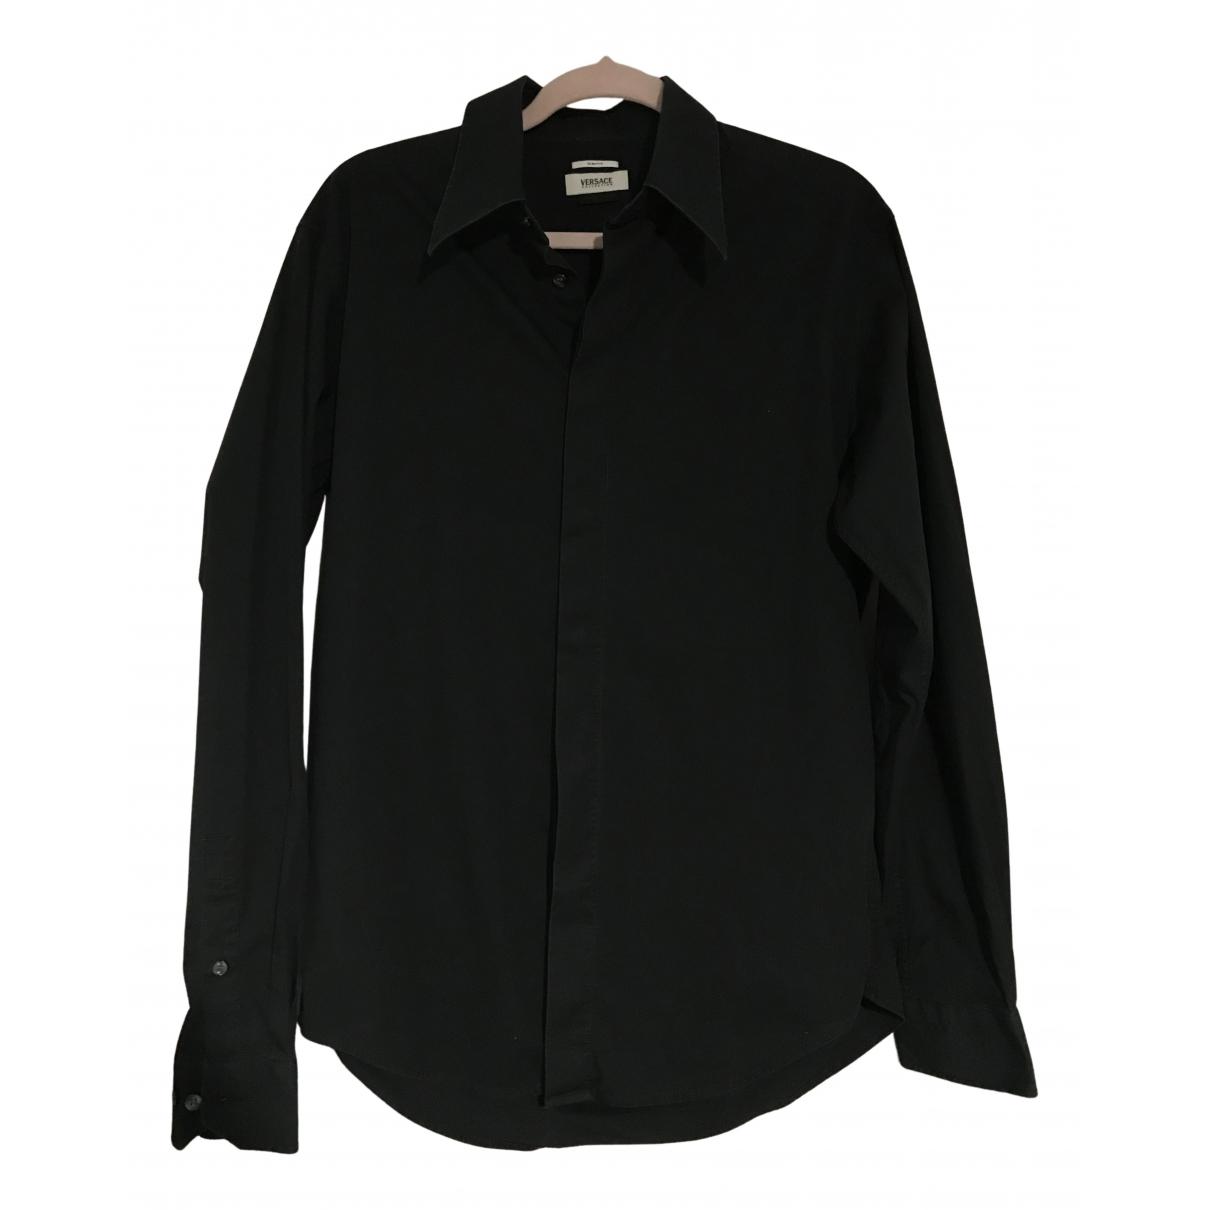 Versace N Black Cotton Shirts for Men M International